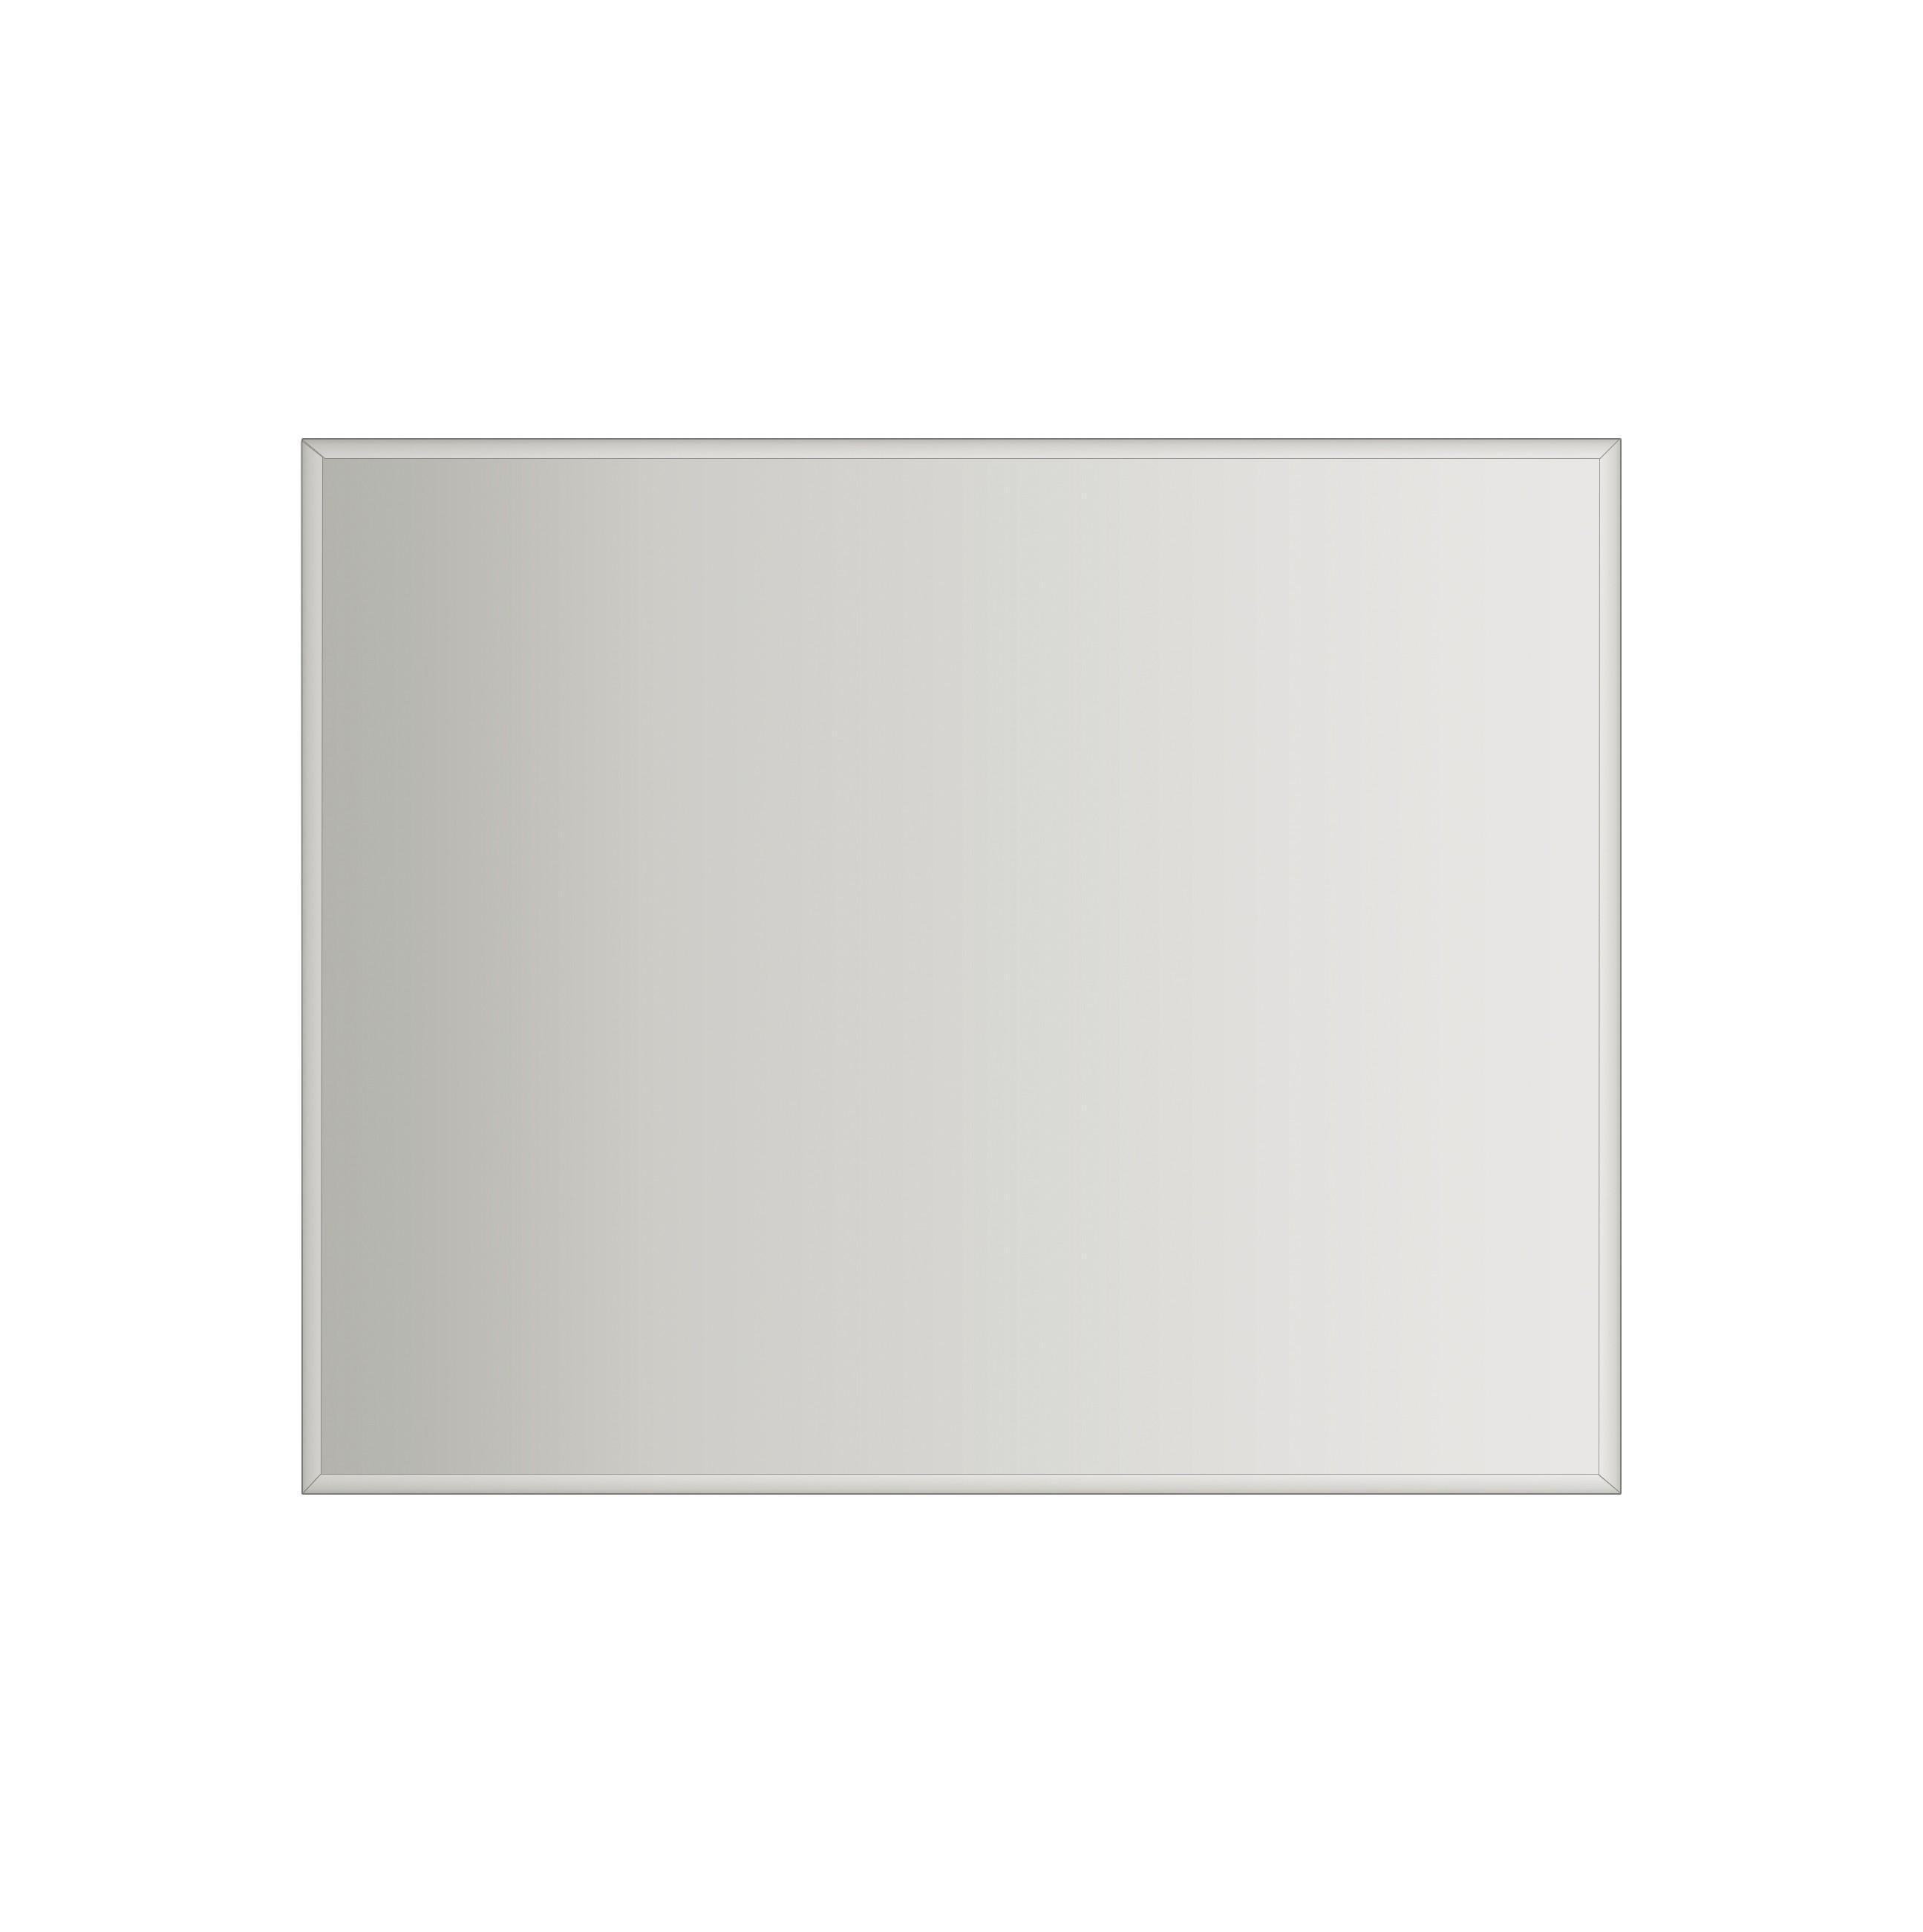 Reflekta Bevelled Edge Mirror 1500X1200Mm | Highgrove Bathrooms With Bevelled Mirror (View 17 of 20)